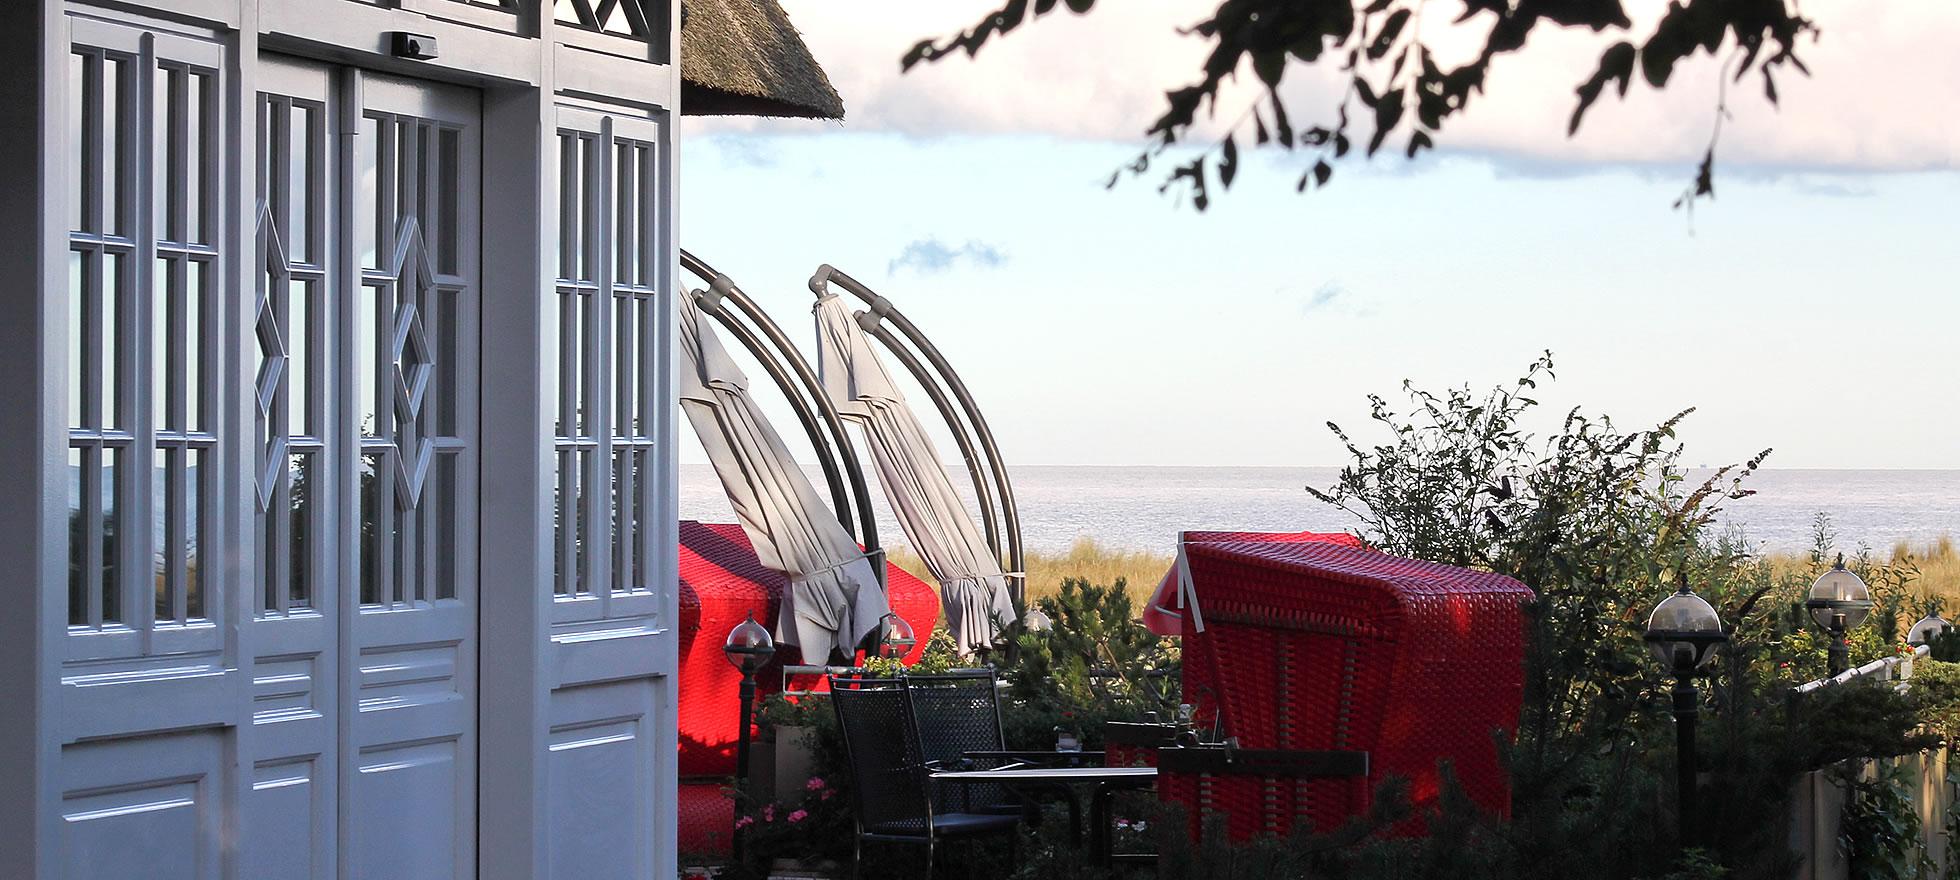 Hotel Namenlos, Caféterrasse mit Meerblick